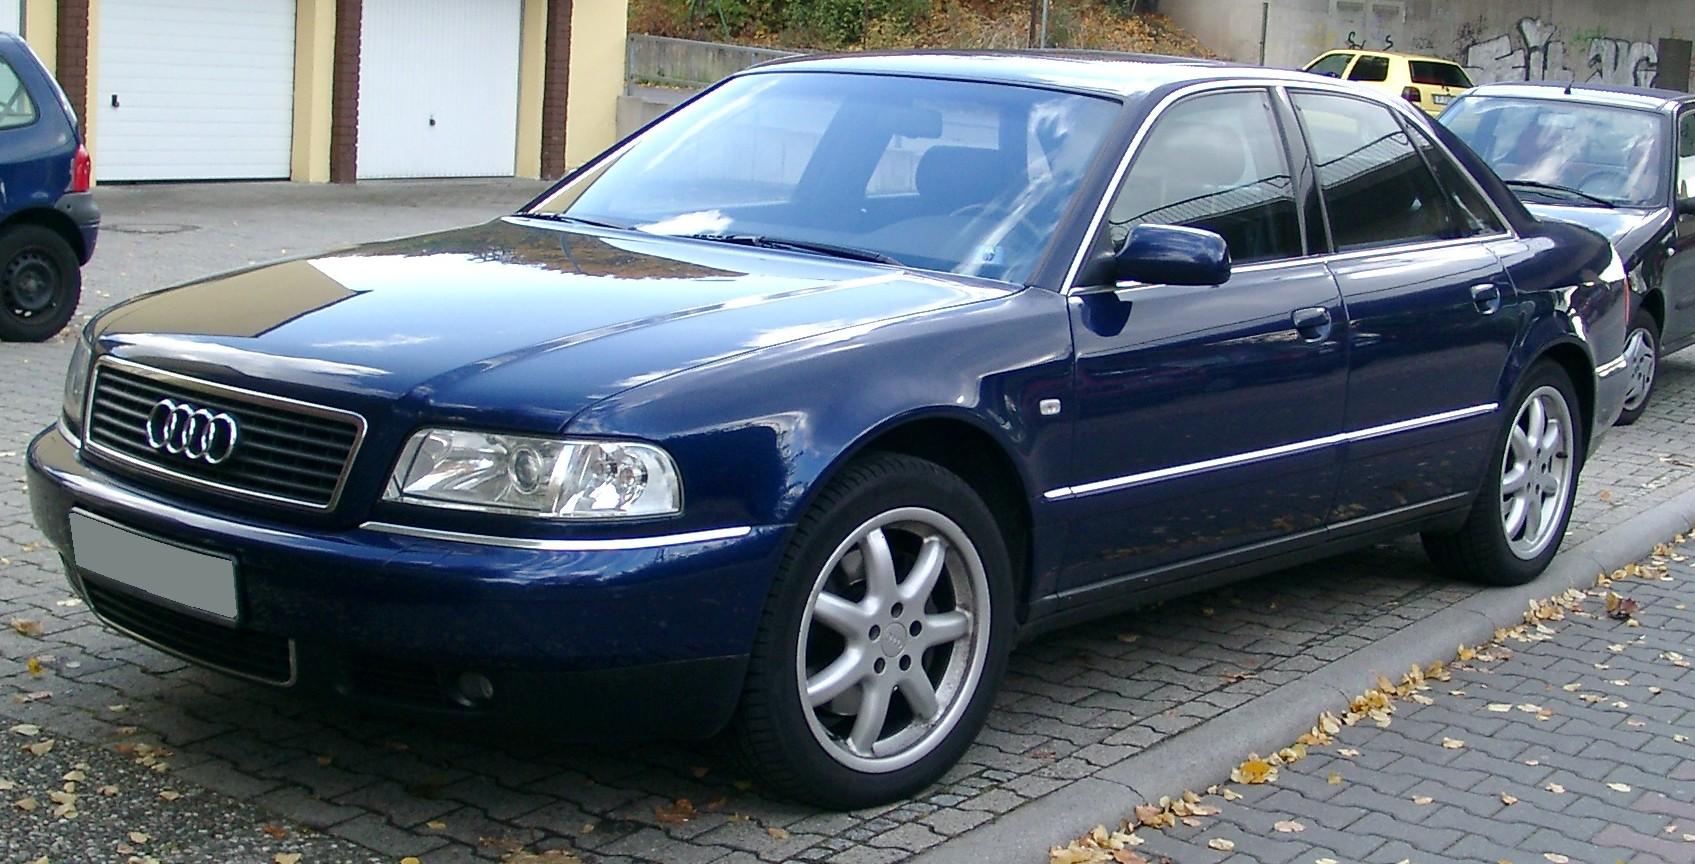 AUDI A8 blue